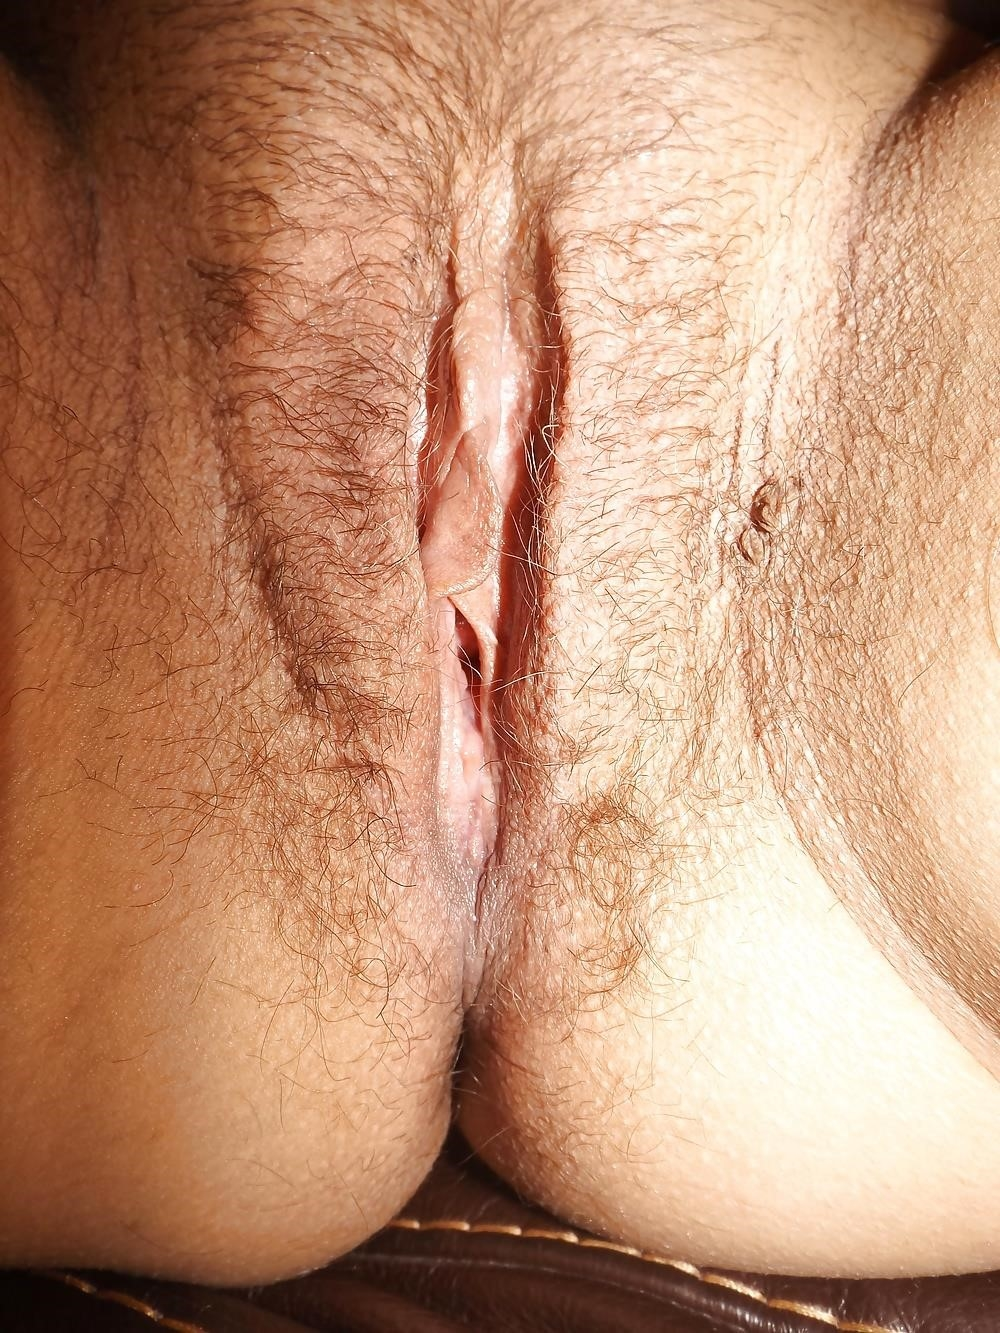 Xnxx boobs anal-6108